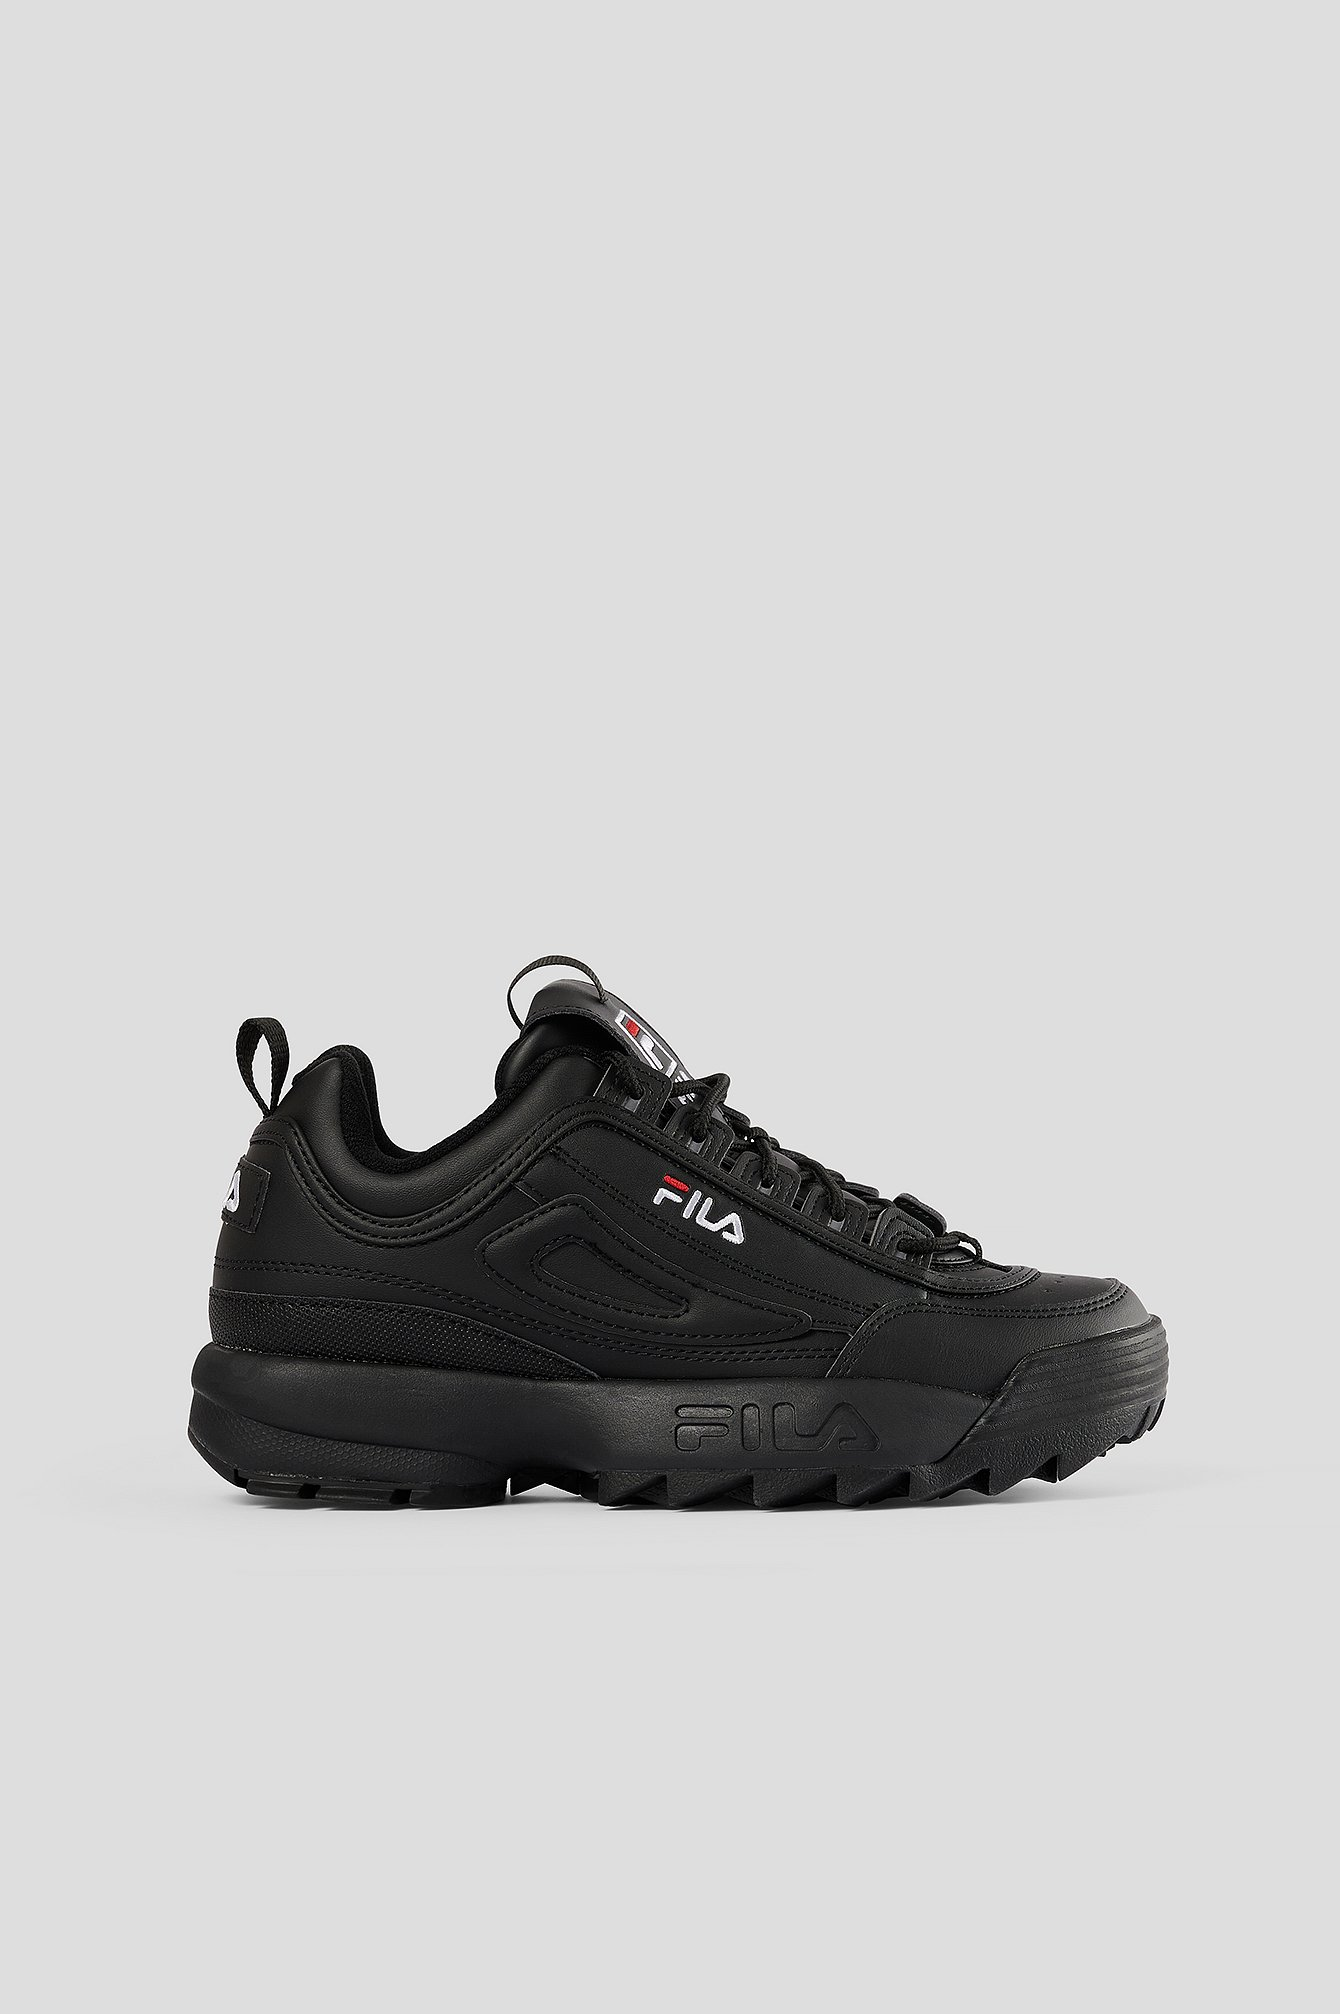 FILA Chunky Sneakers - Black